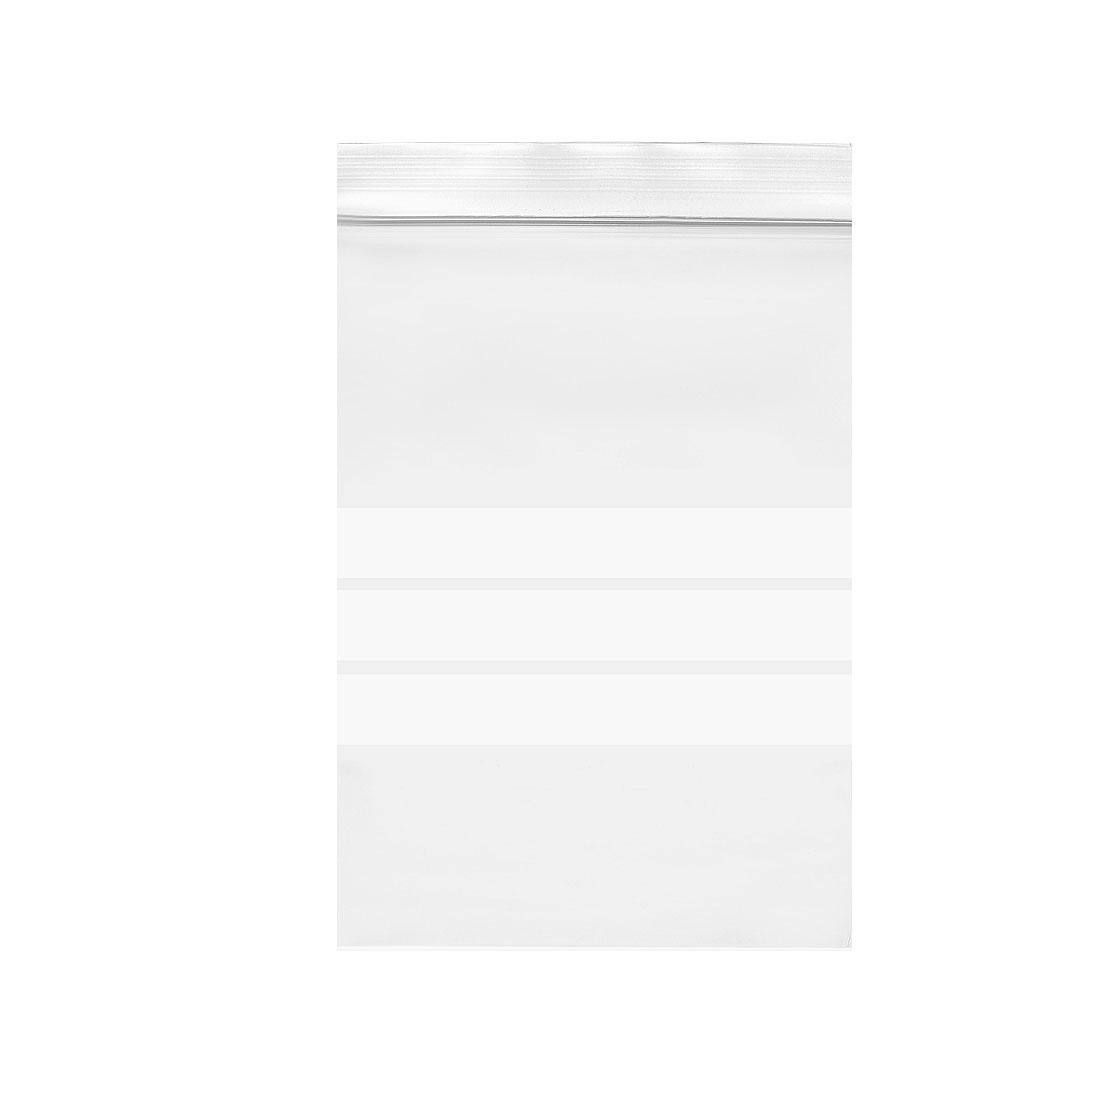 "100 Pcs Zip Lock Plastic Bags Writable Reclosable Disposable Clear 5""X3.5"" 8 MIL"